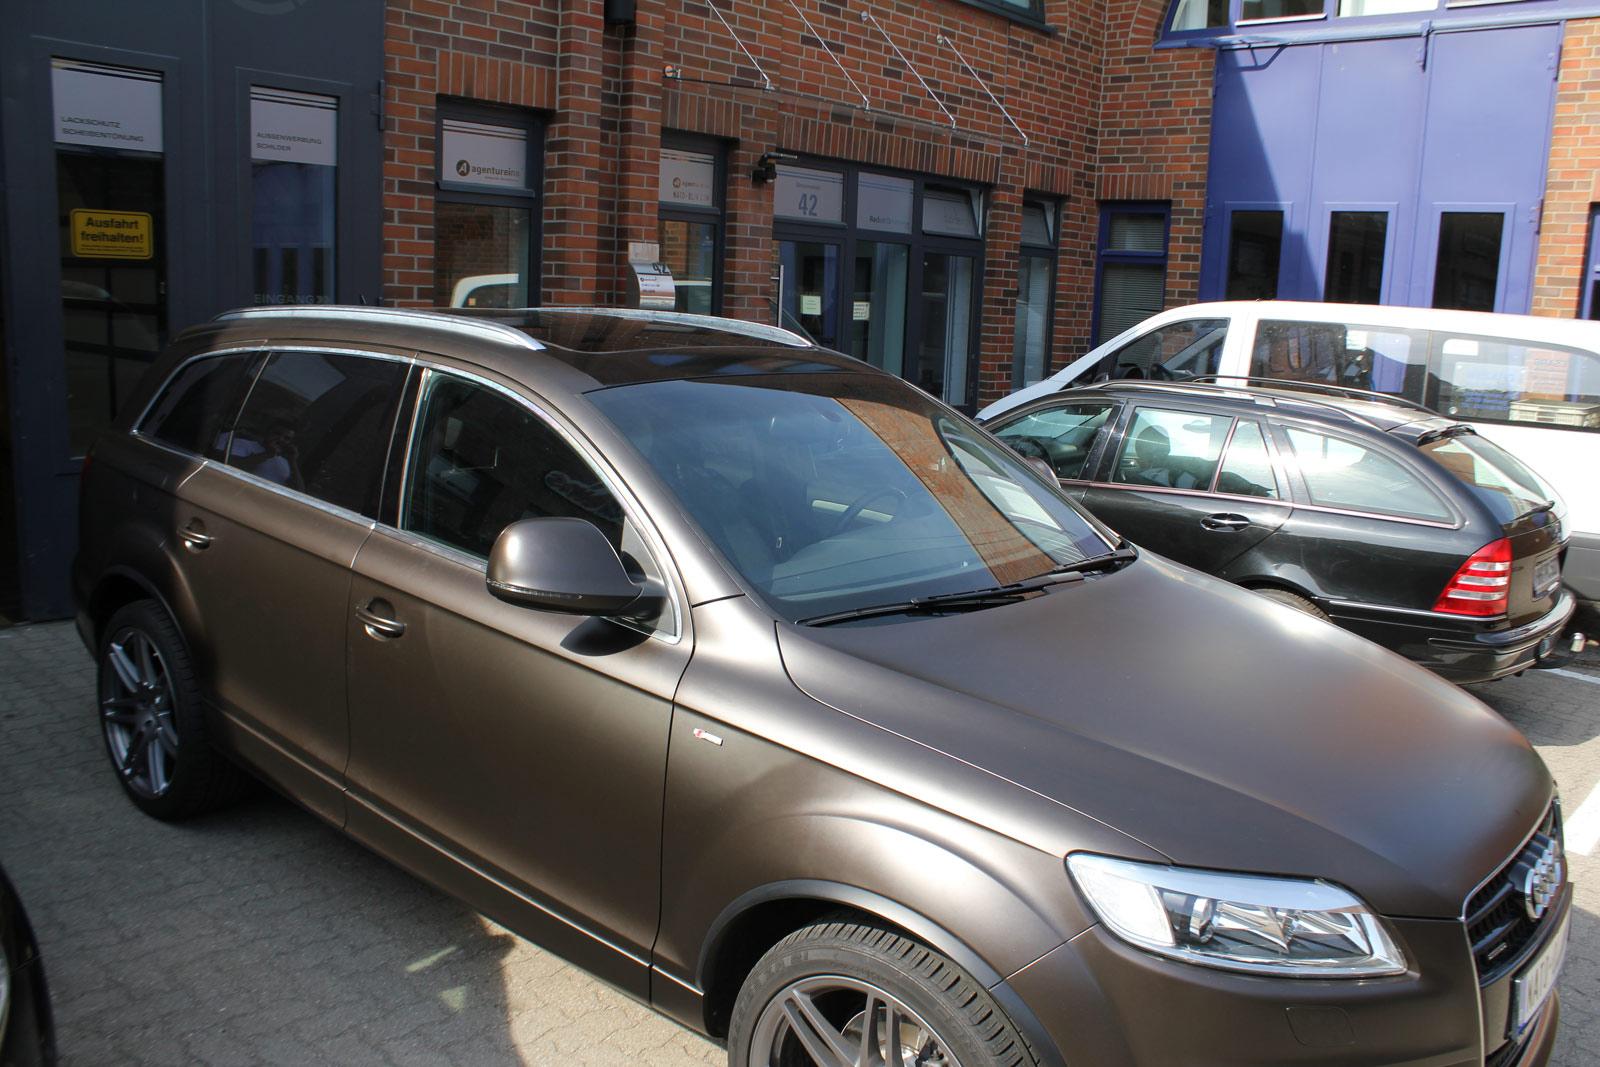 Audi_Q7_Folierung_Braun_Matt_Metallic_12